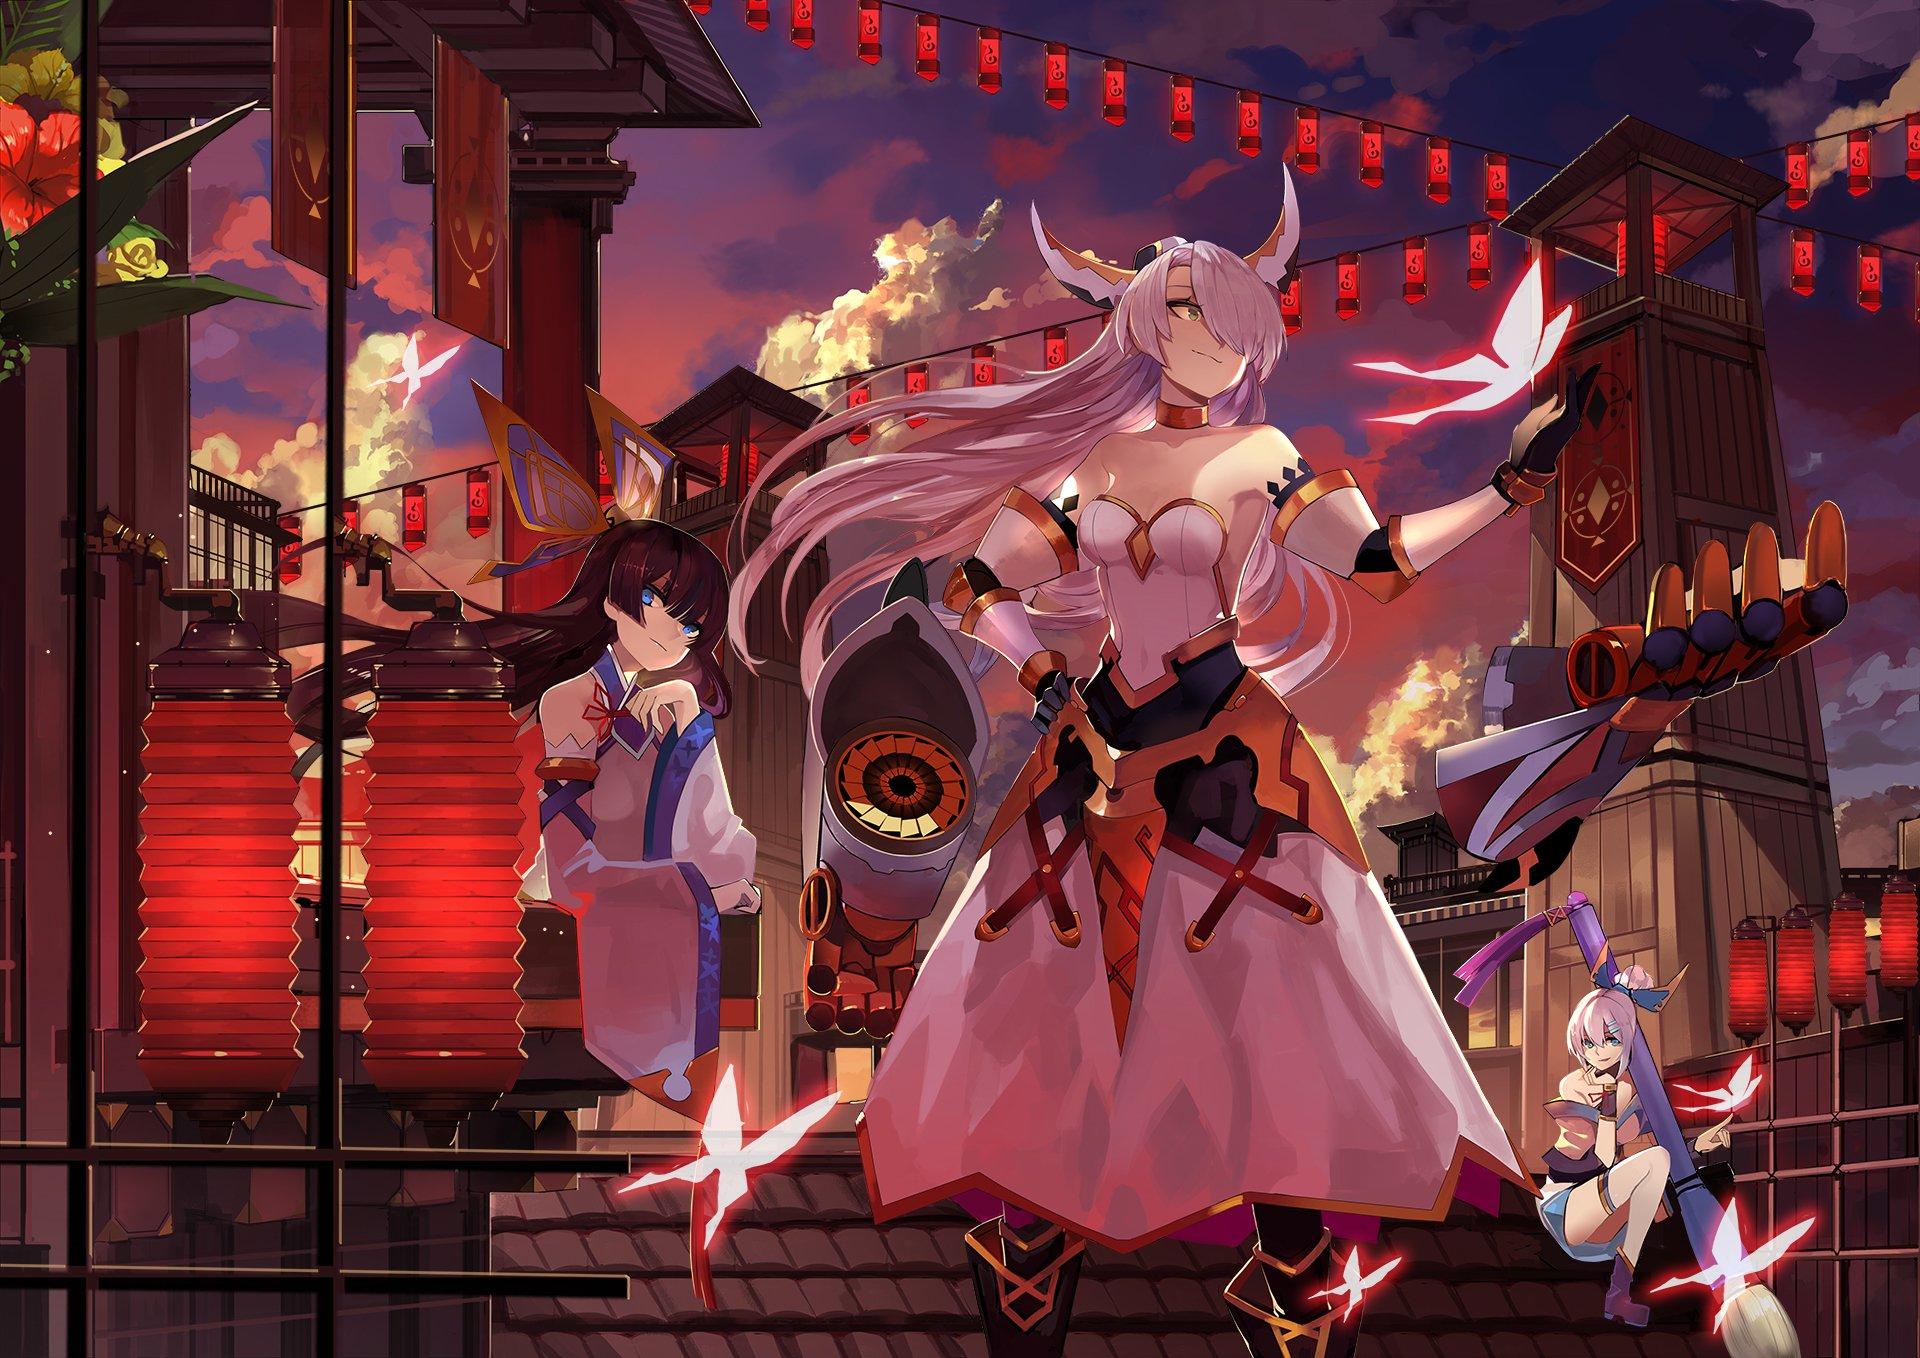 Anime Girls Fond D 233 Cran Hd Arri 232 Re Plan 1920x1358